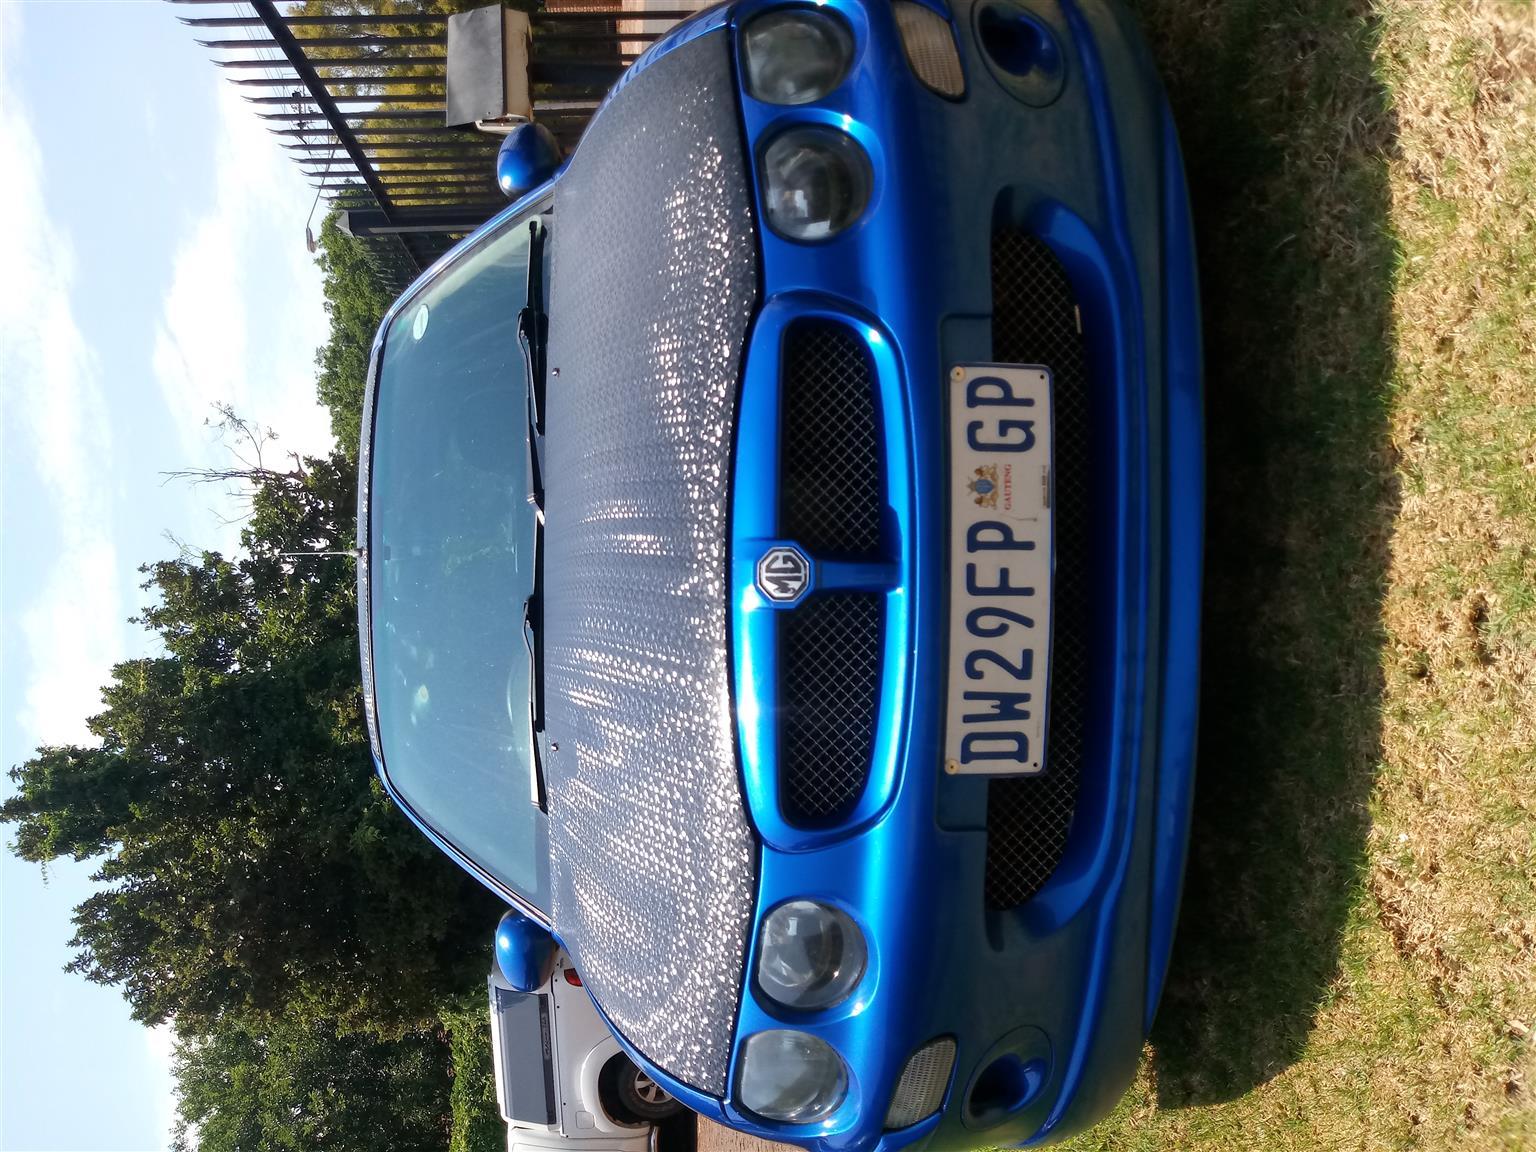 2004 MG MGB